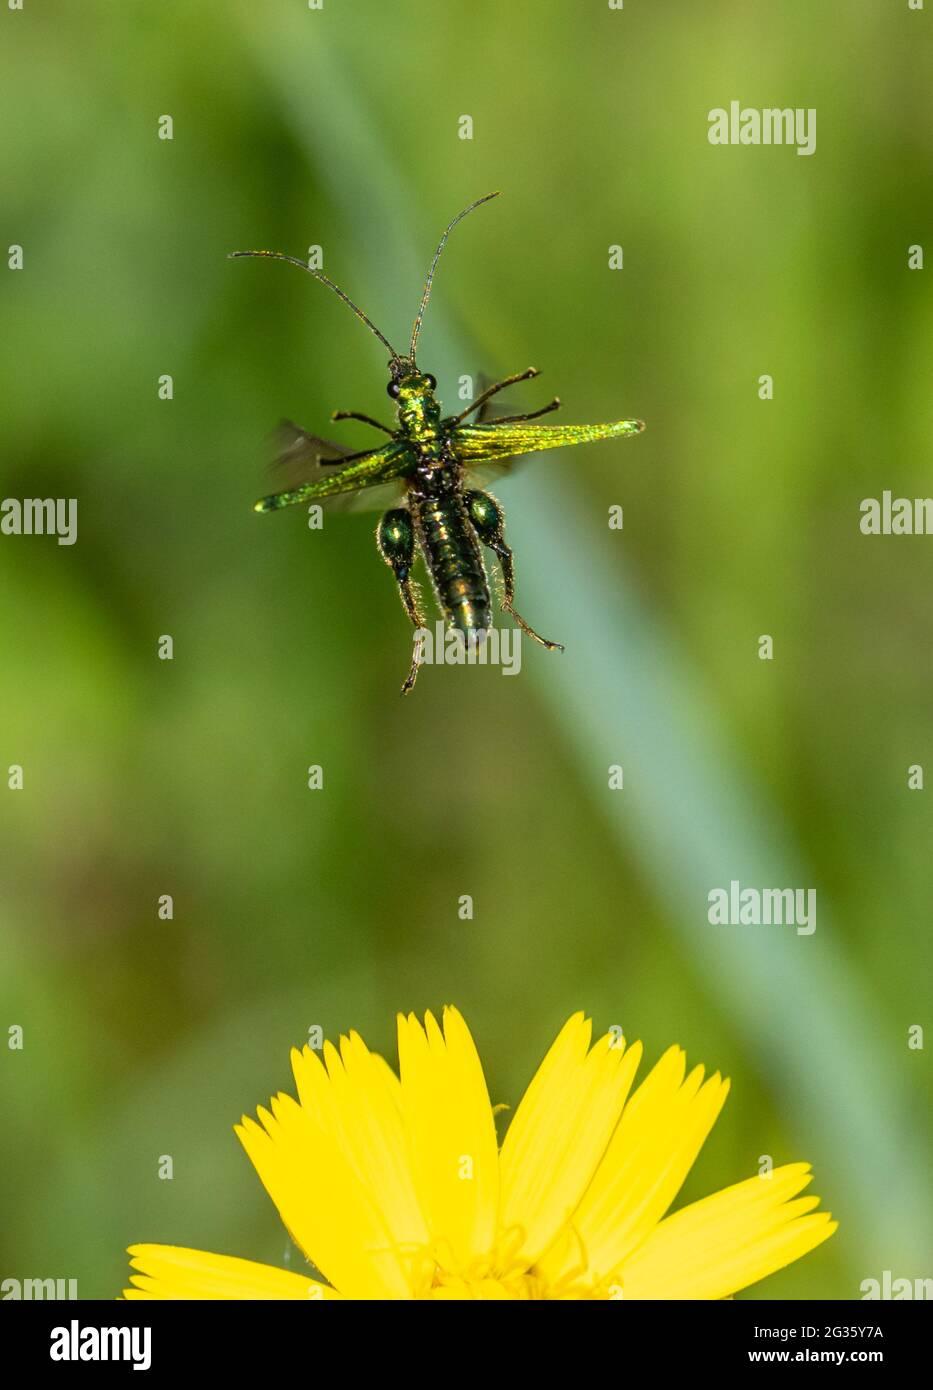 thick-legged-flower-beetle-oedemera-nobilis-in-flight-metallic-green-beetle-taking-off-from-wildflower-on-sunny-june-day-uk-2G35Y7A.jpg